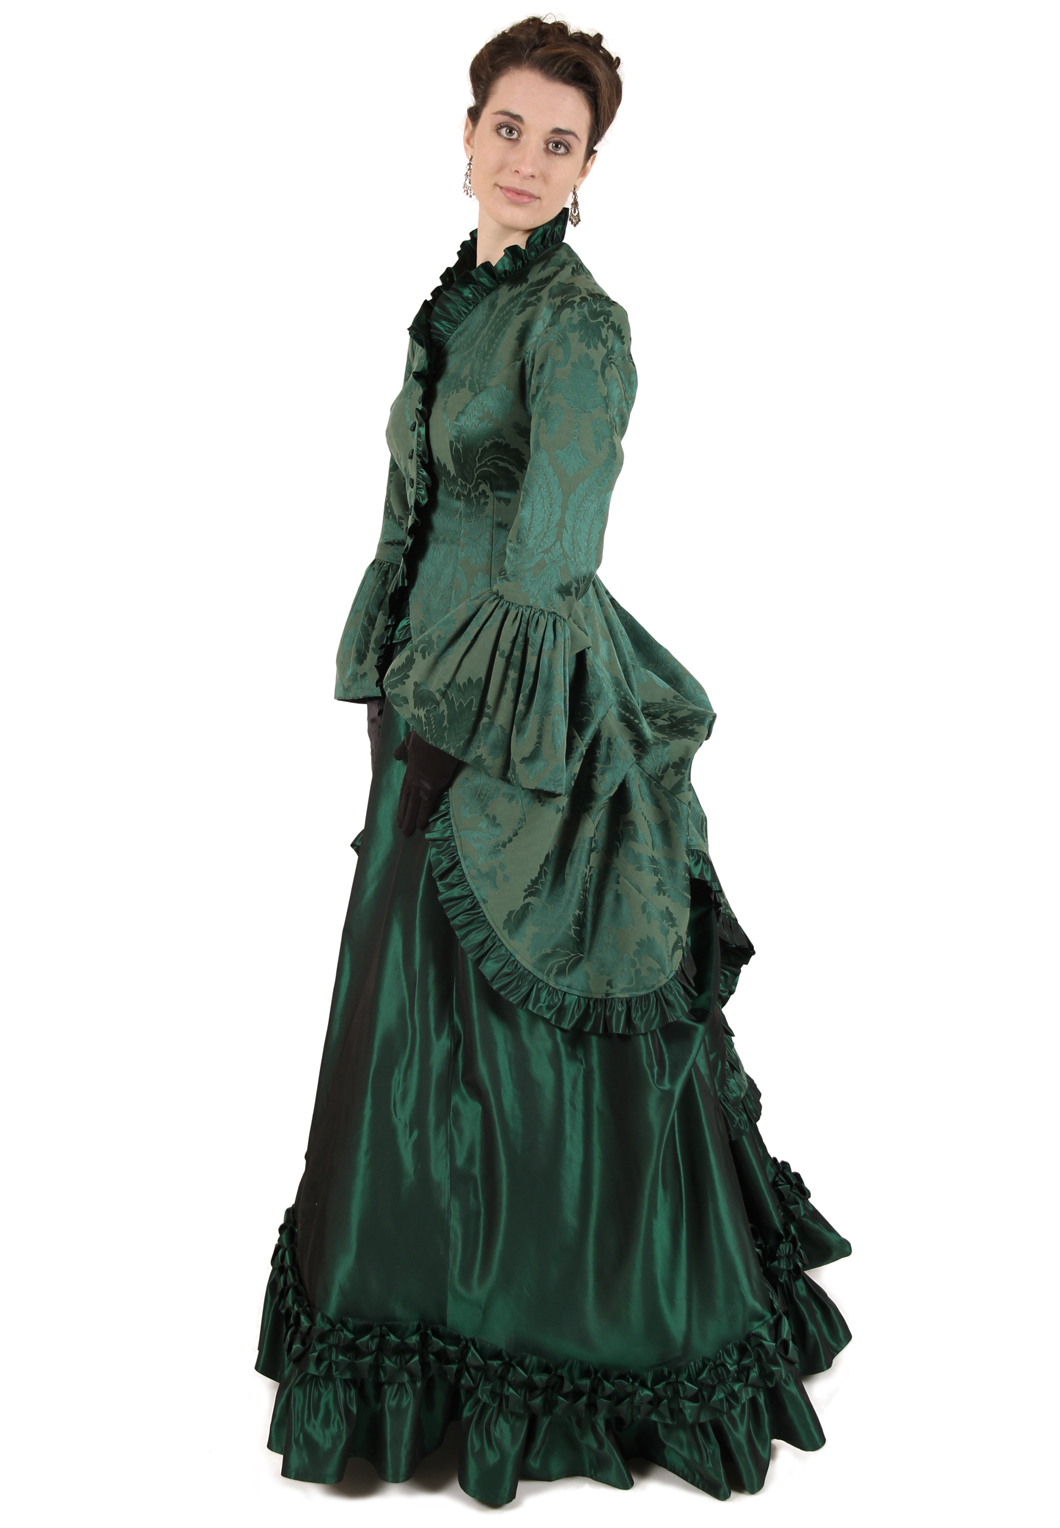 Renata Victorian Polonaise Dress | Recollections